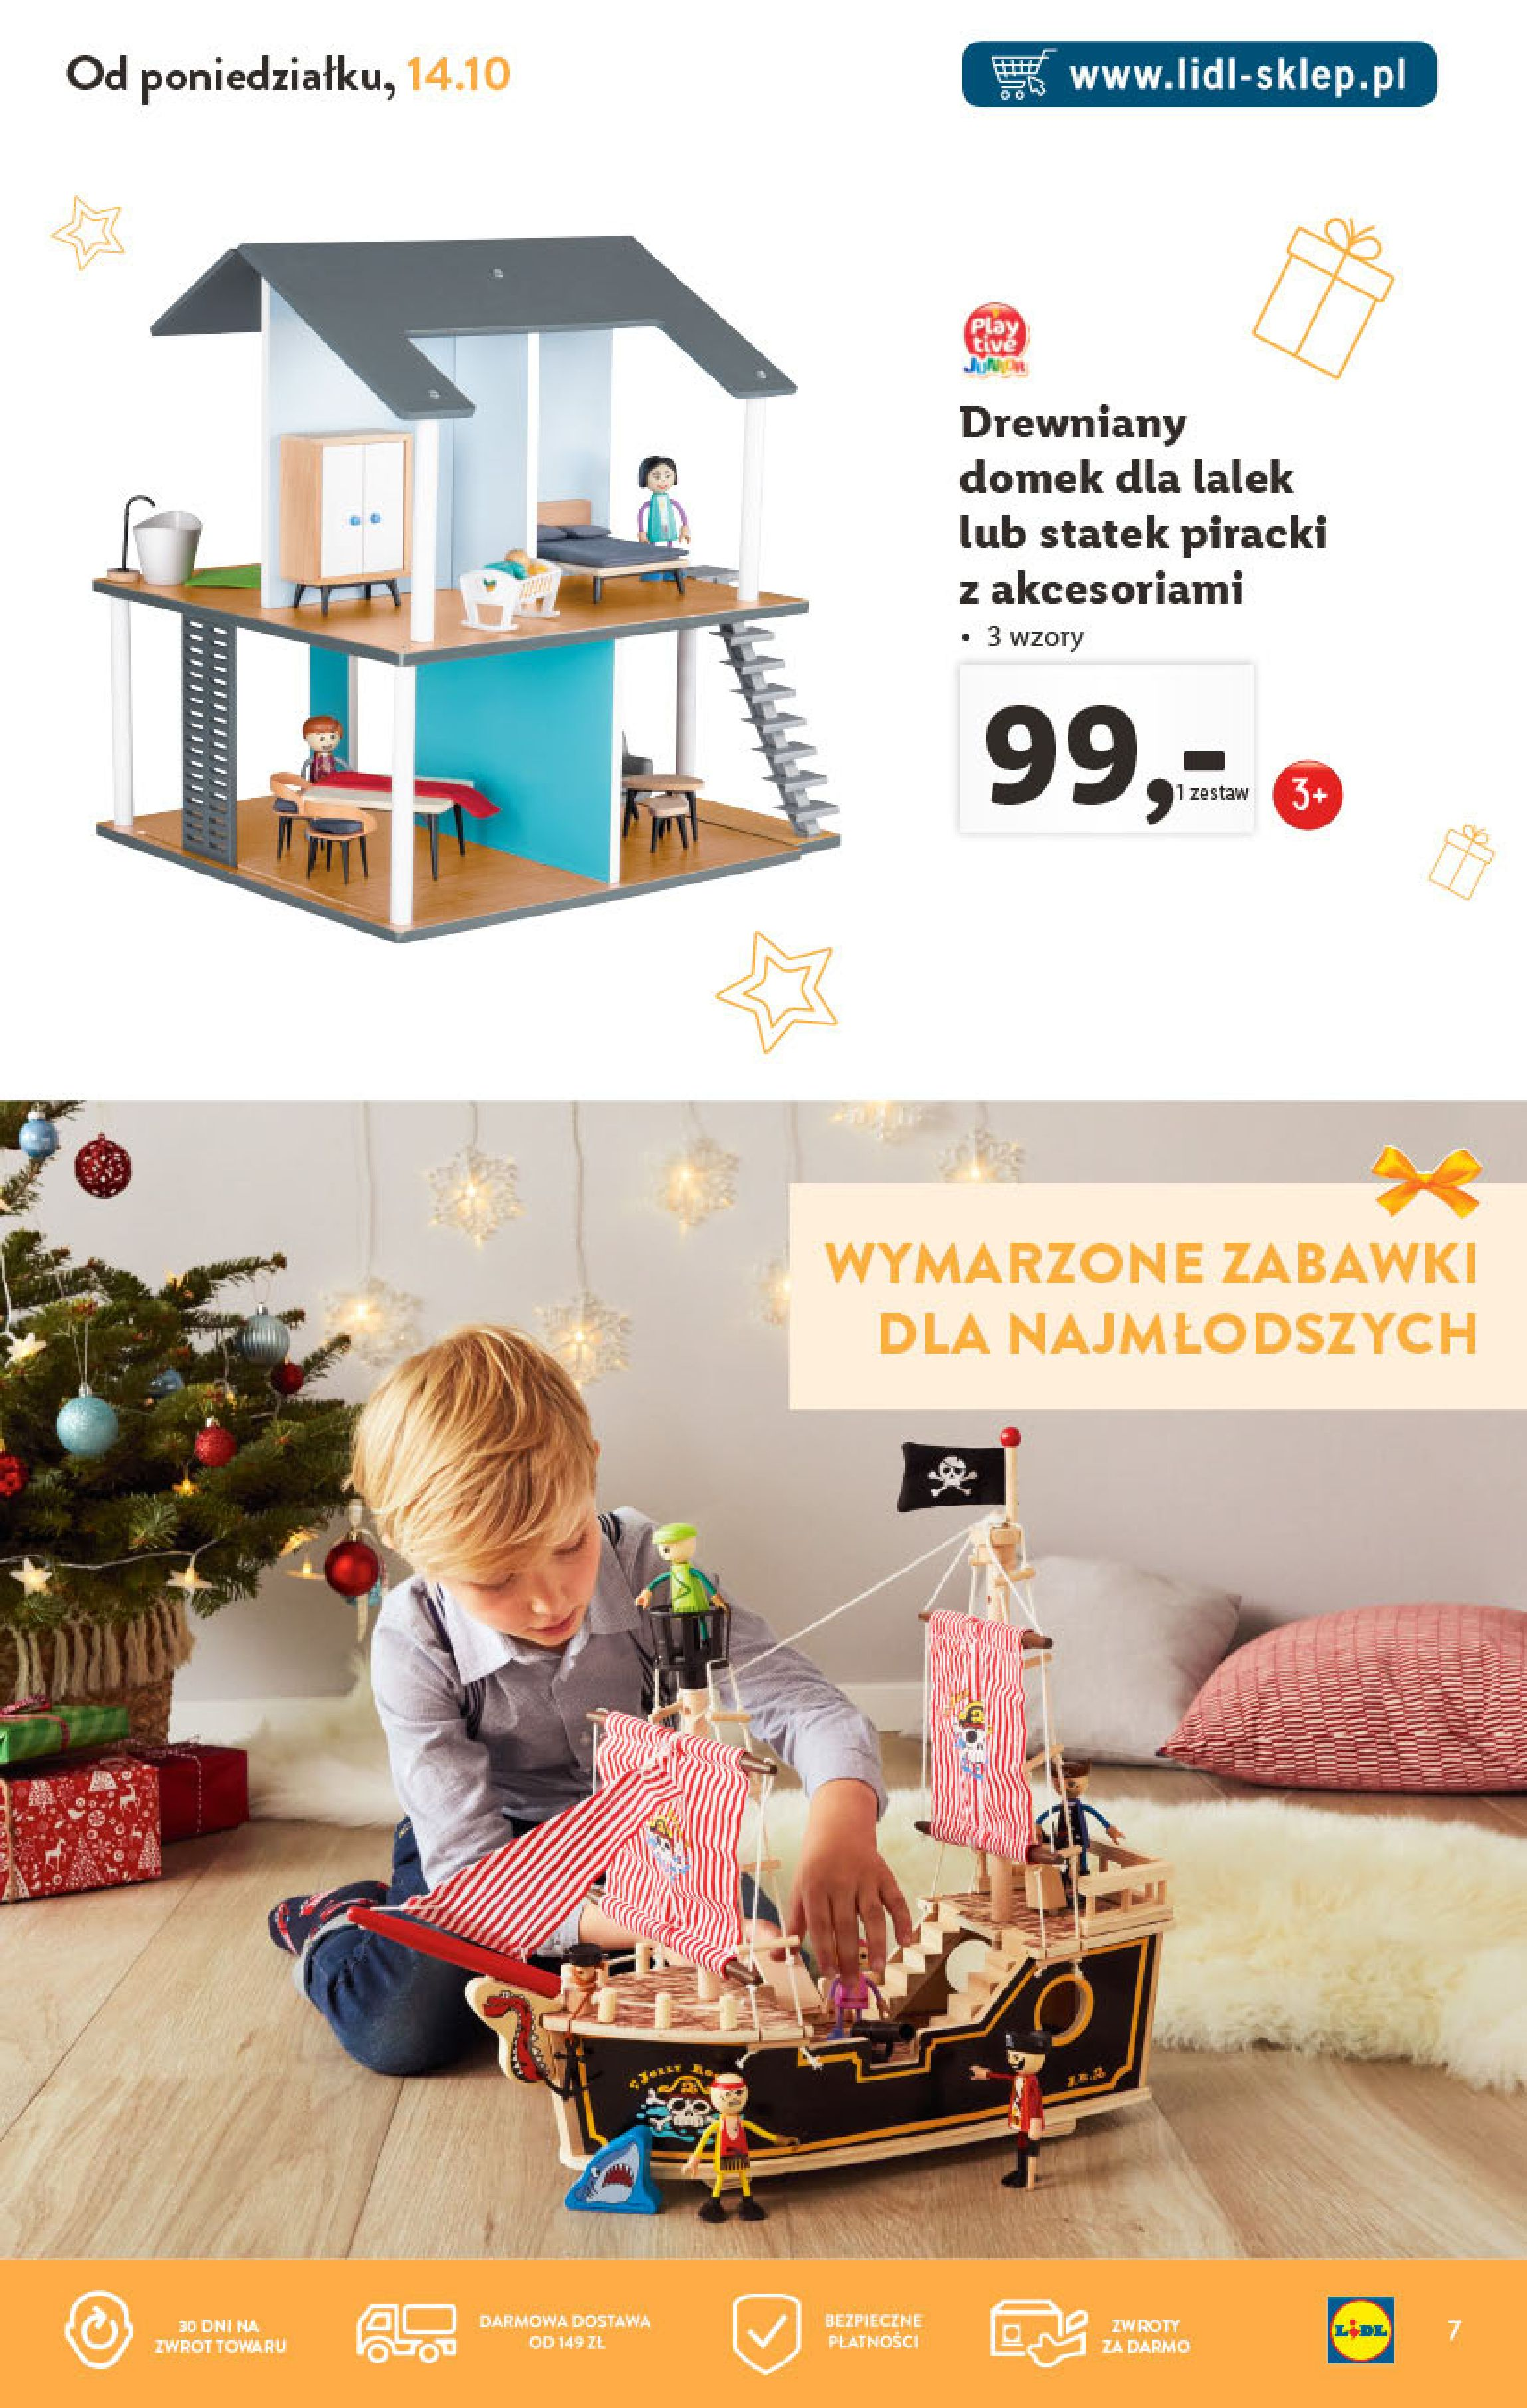 Gazetka Lidl - Katalog Online-13.10.2019-02.12.2019-page-7